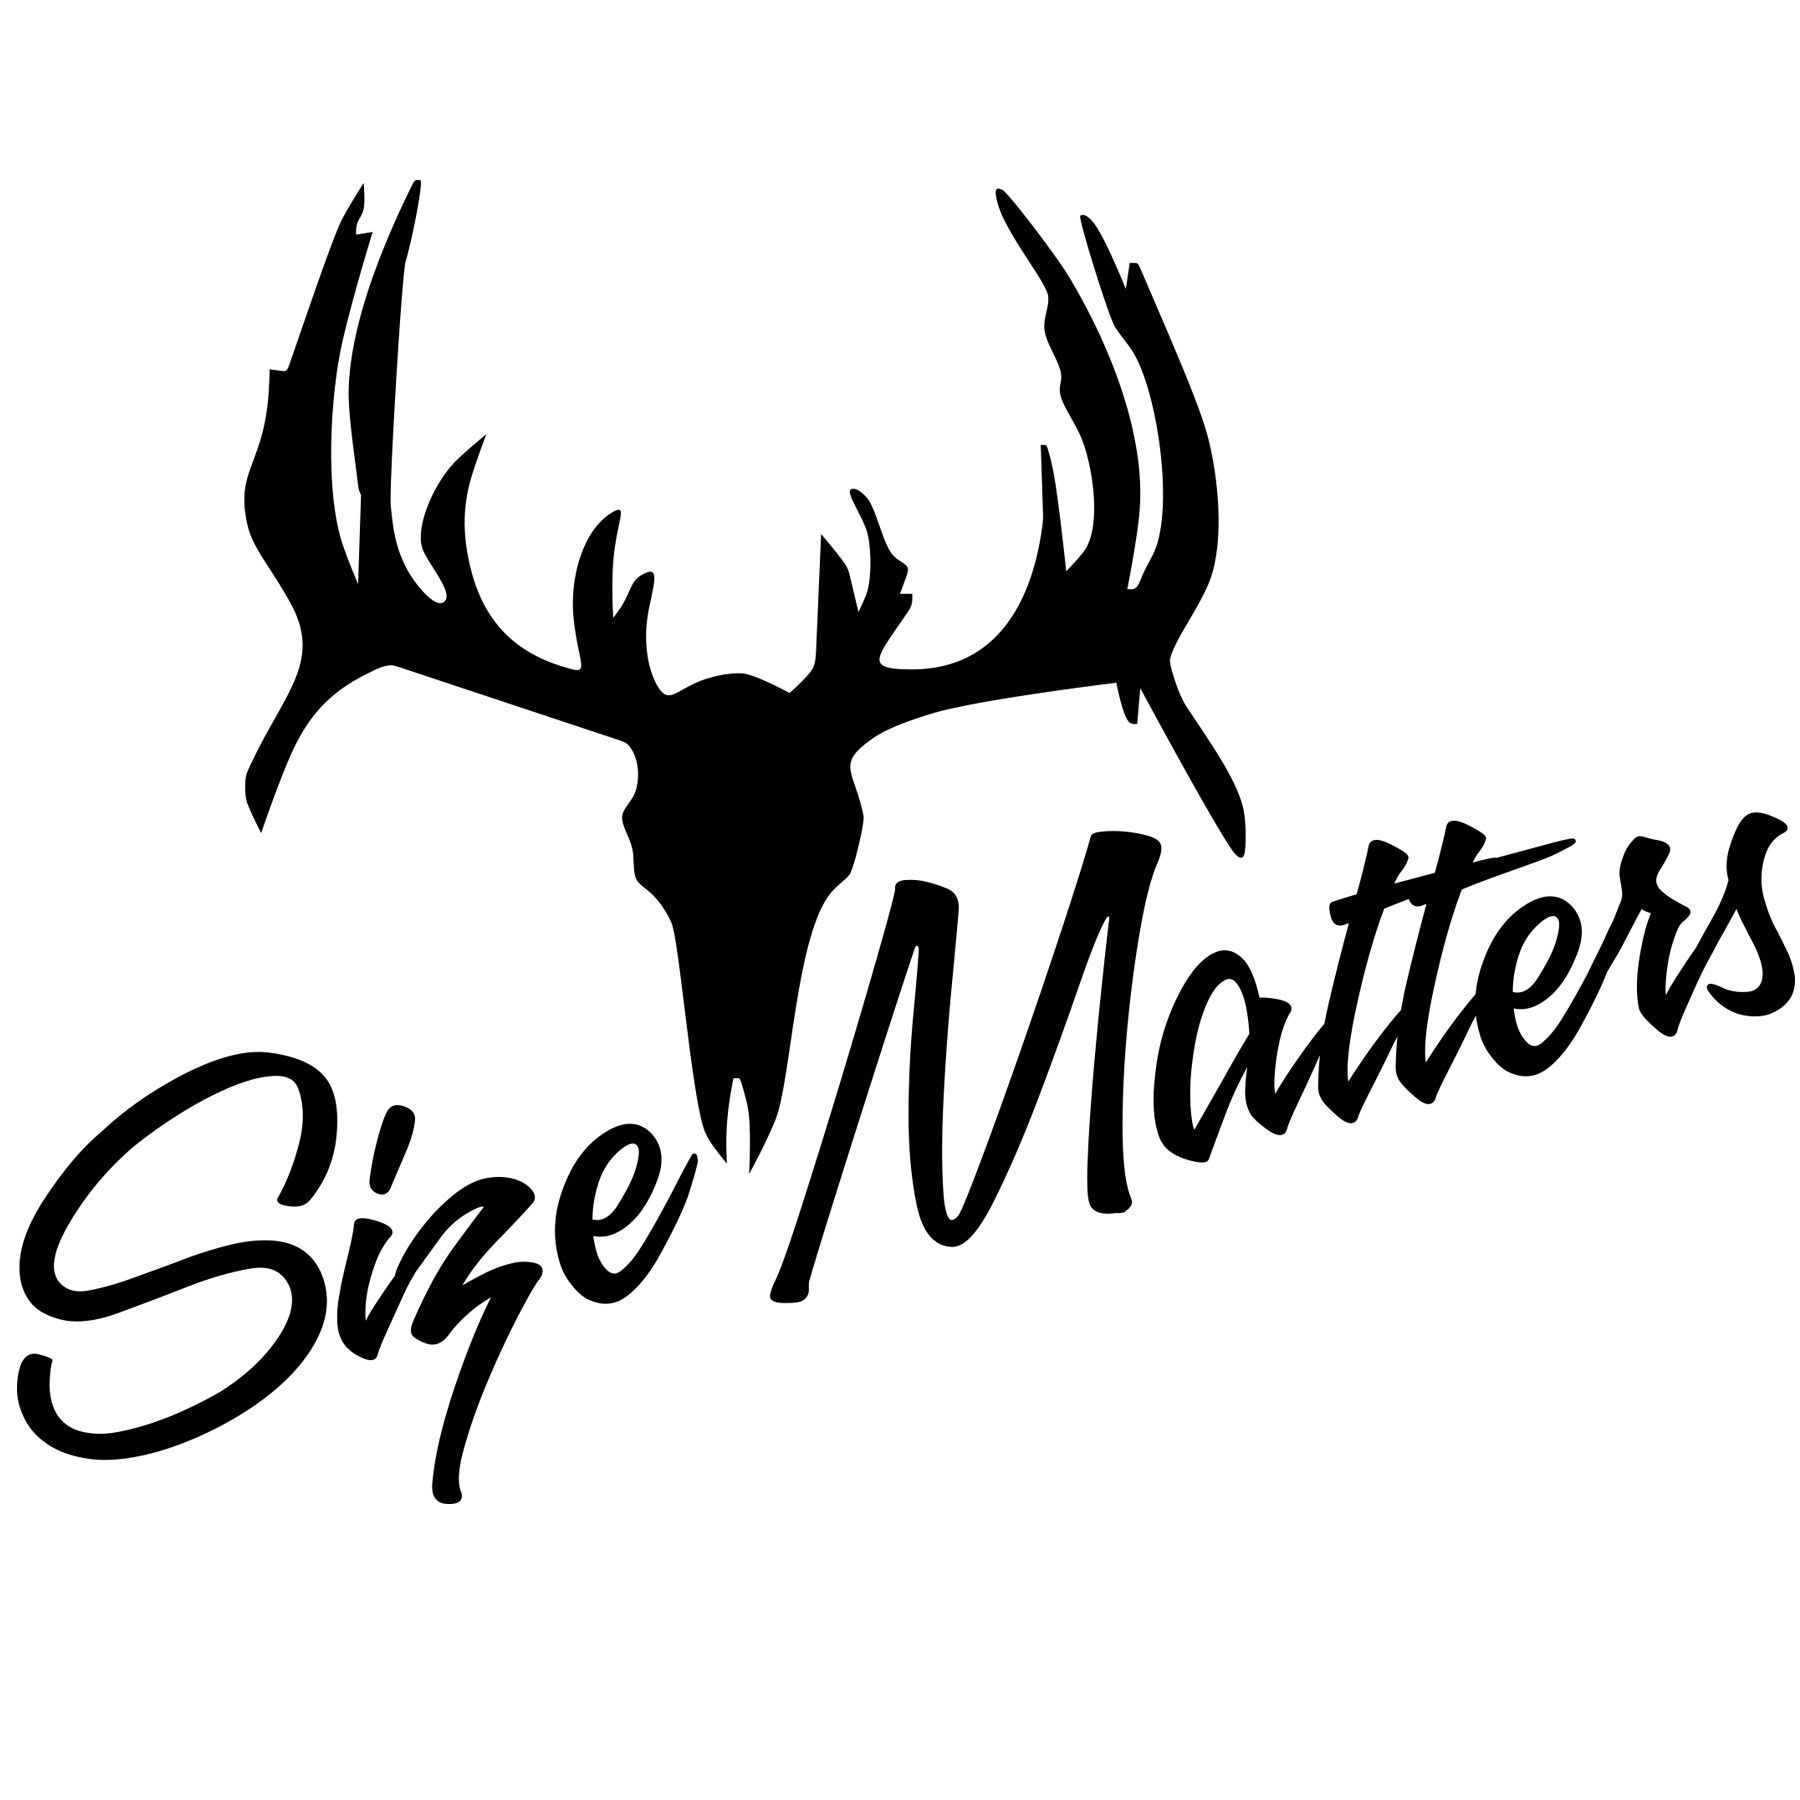 Size Matters Deer Skull Vinyl Sticker